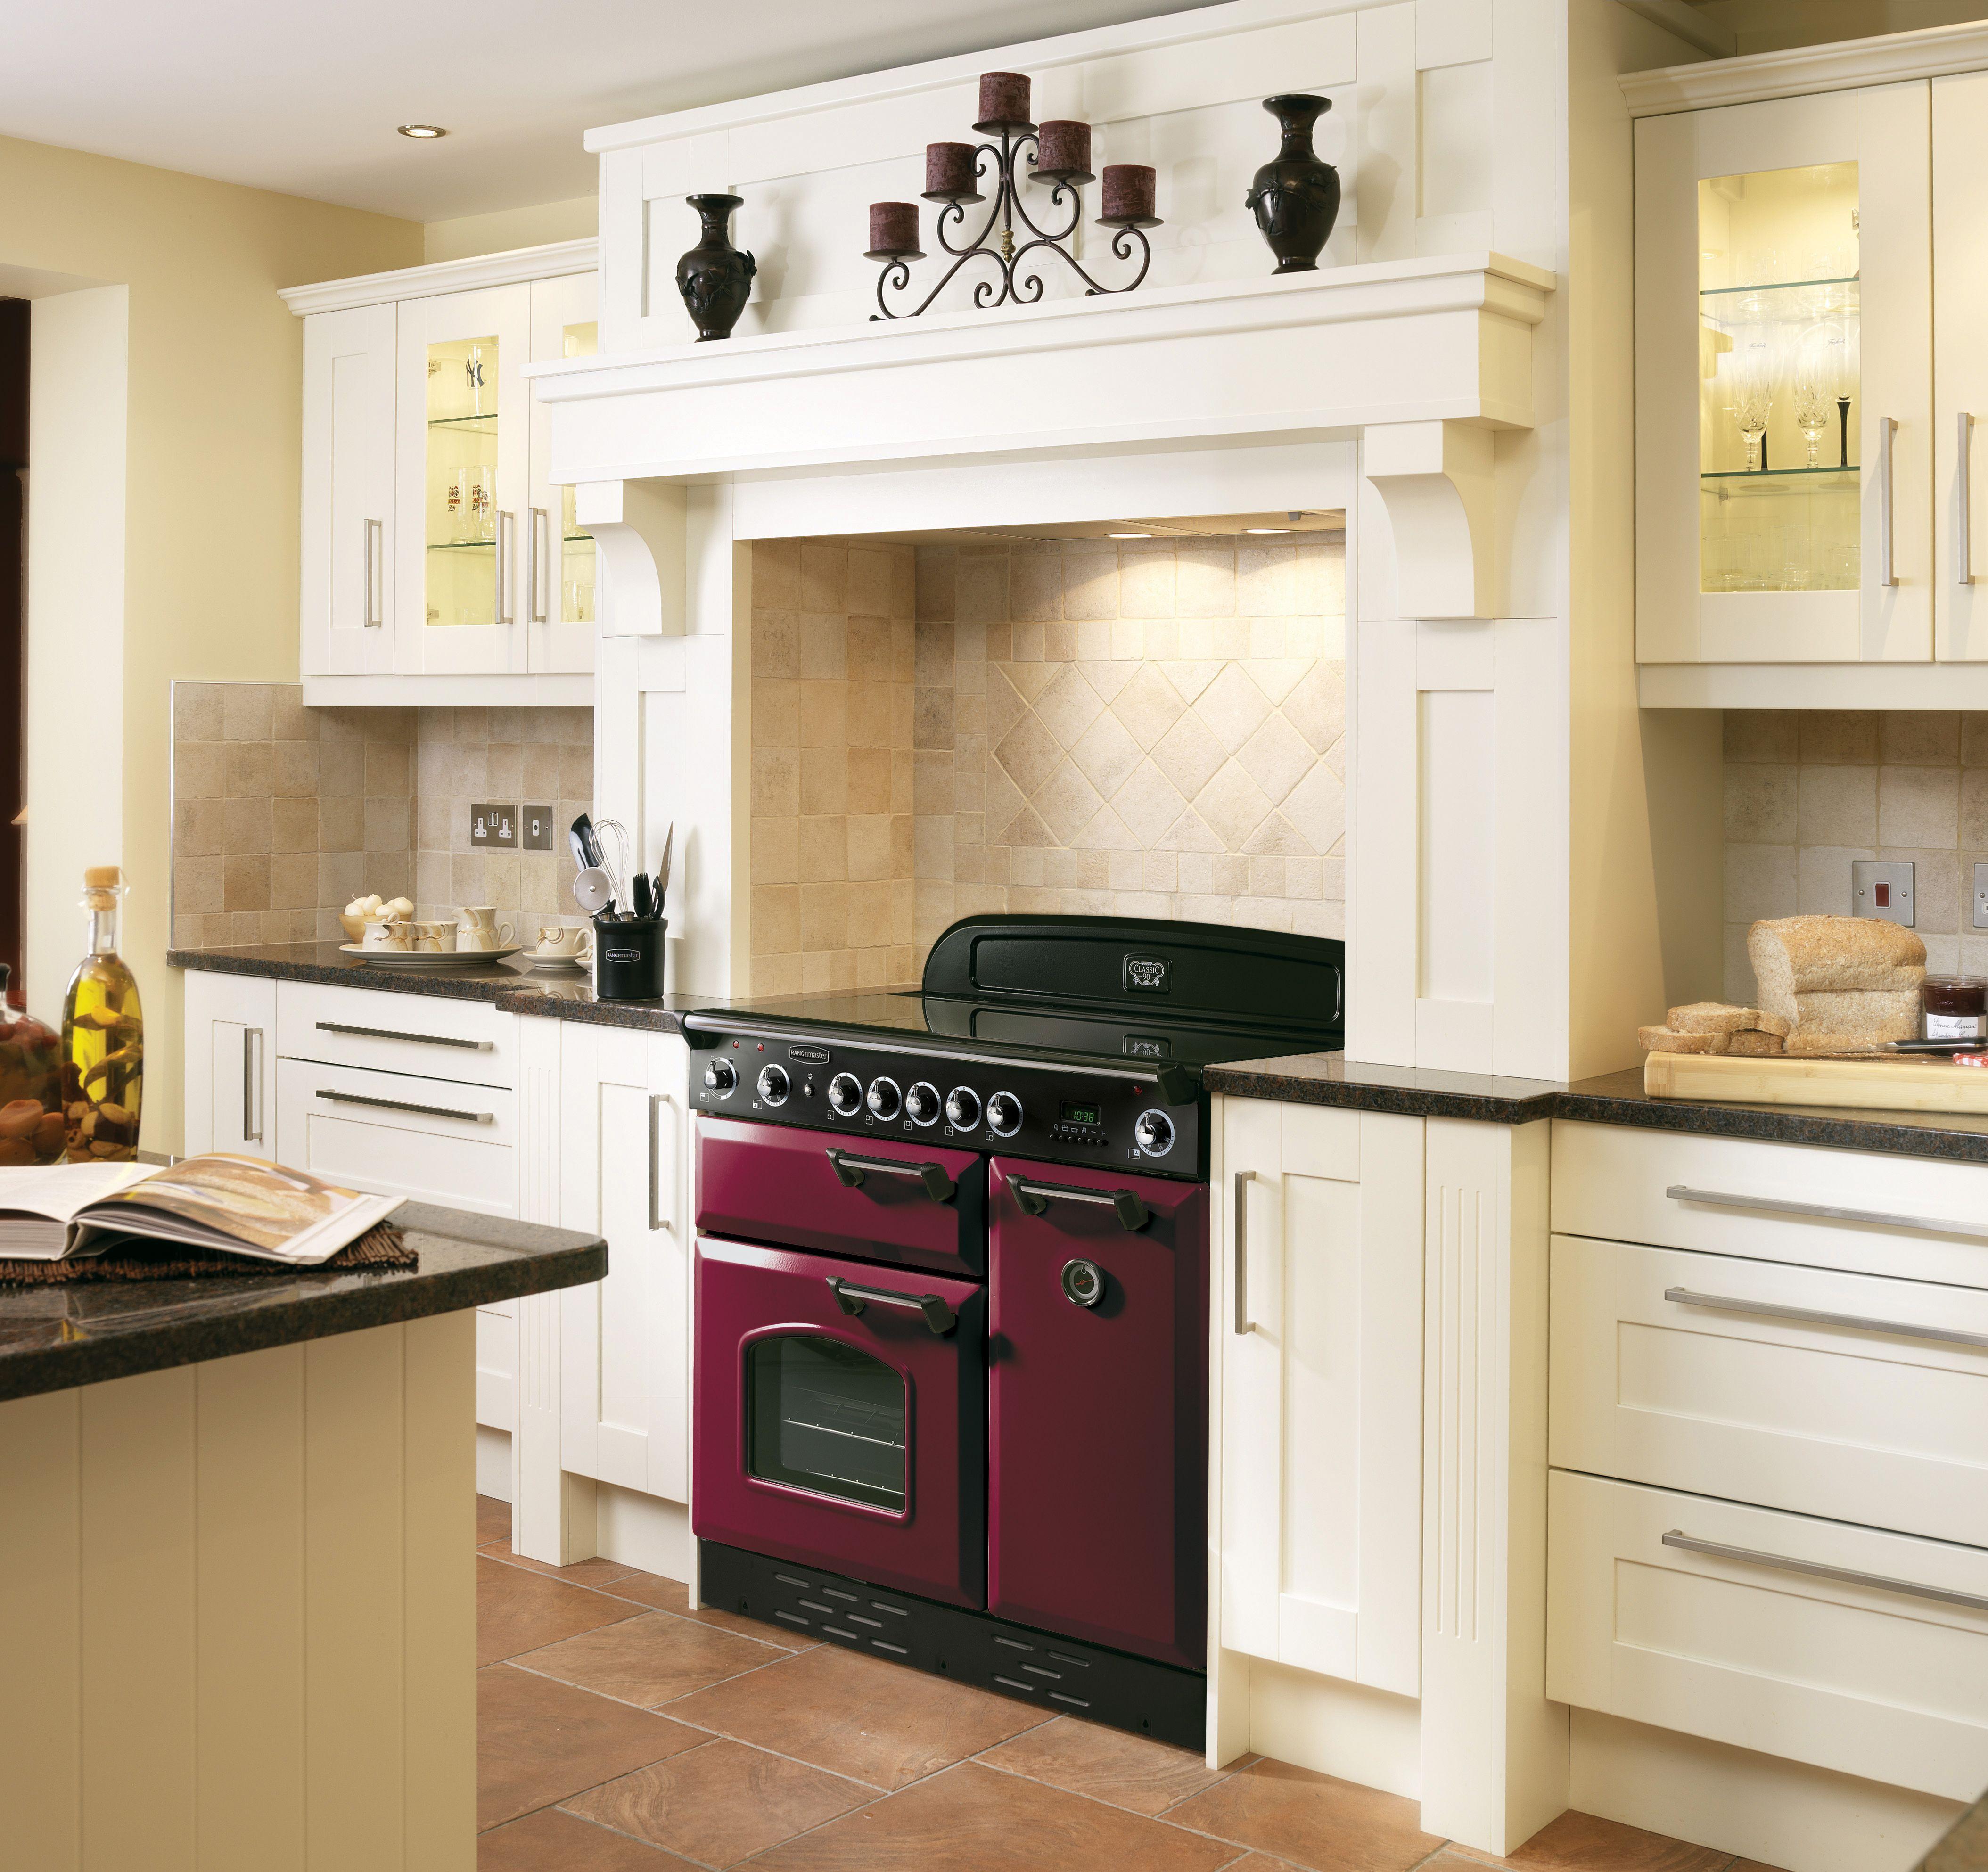 Choosing your perfect range cooker...   Appliance City   Range ...